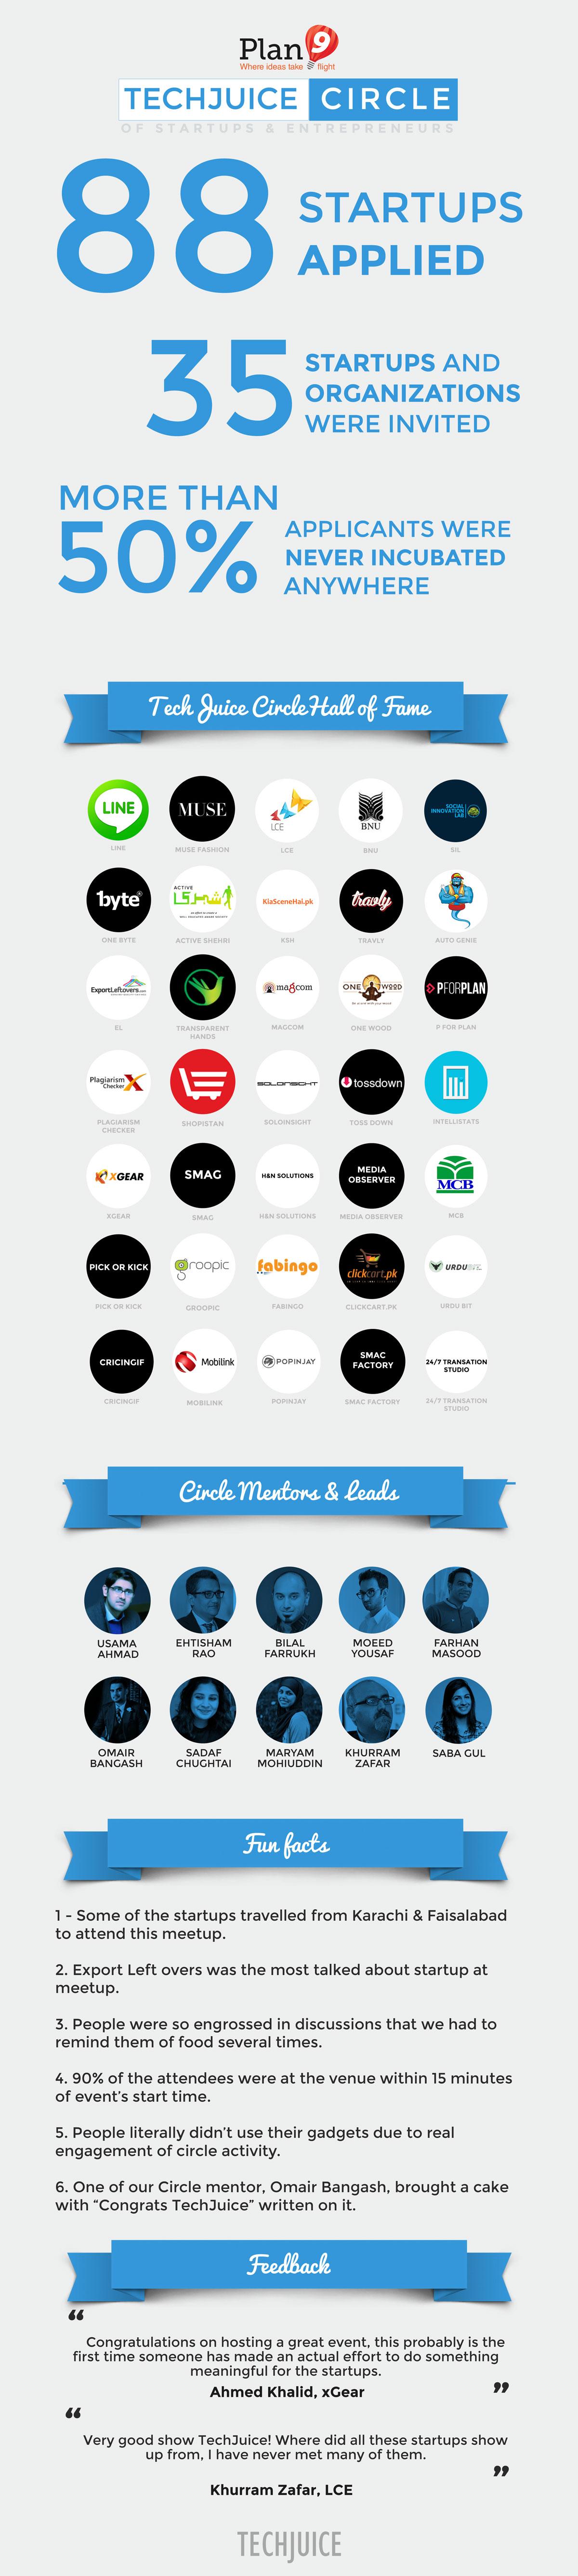 TechJuice Circle Infographic